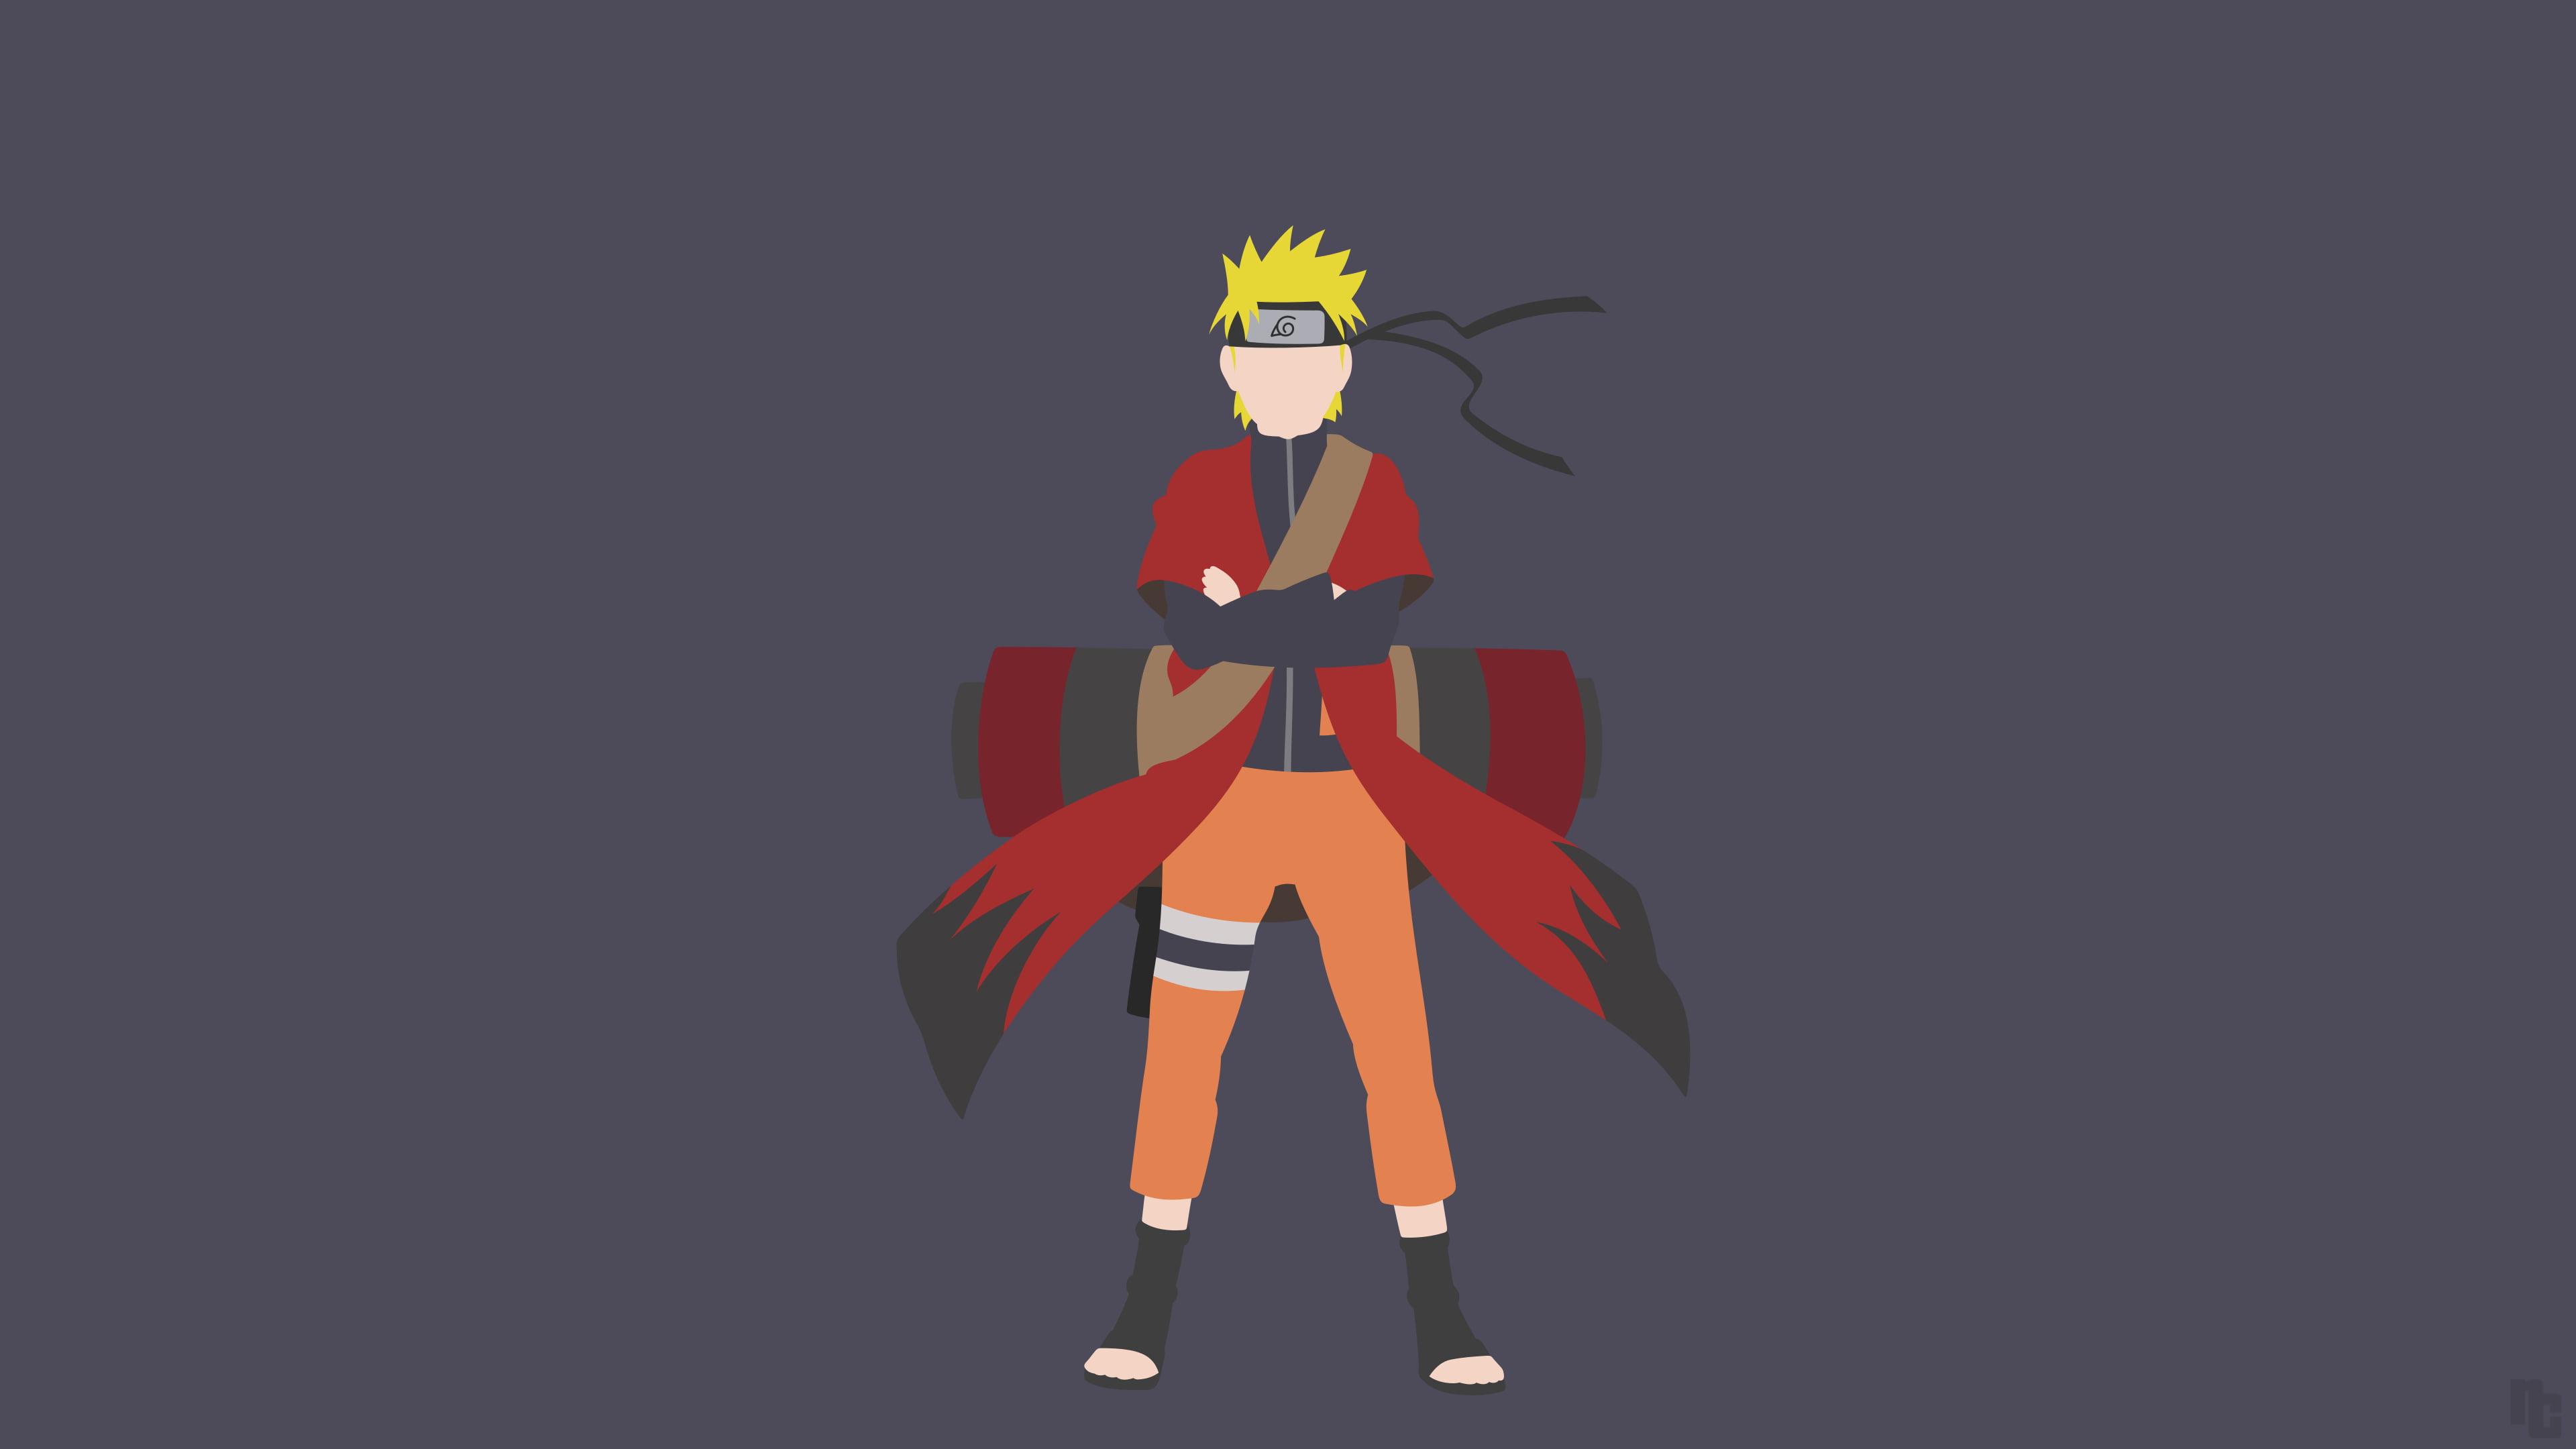 Minimalist Naruto Wallpapers - Wallpaper Cave